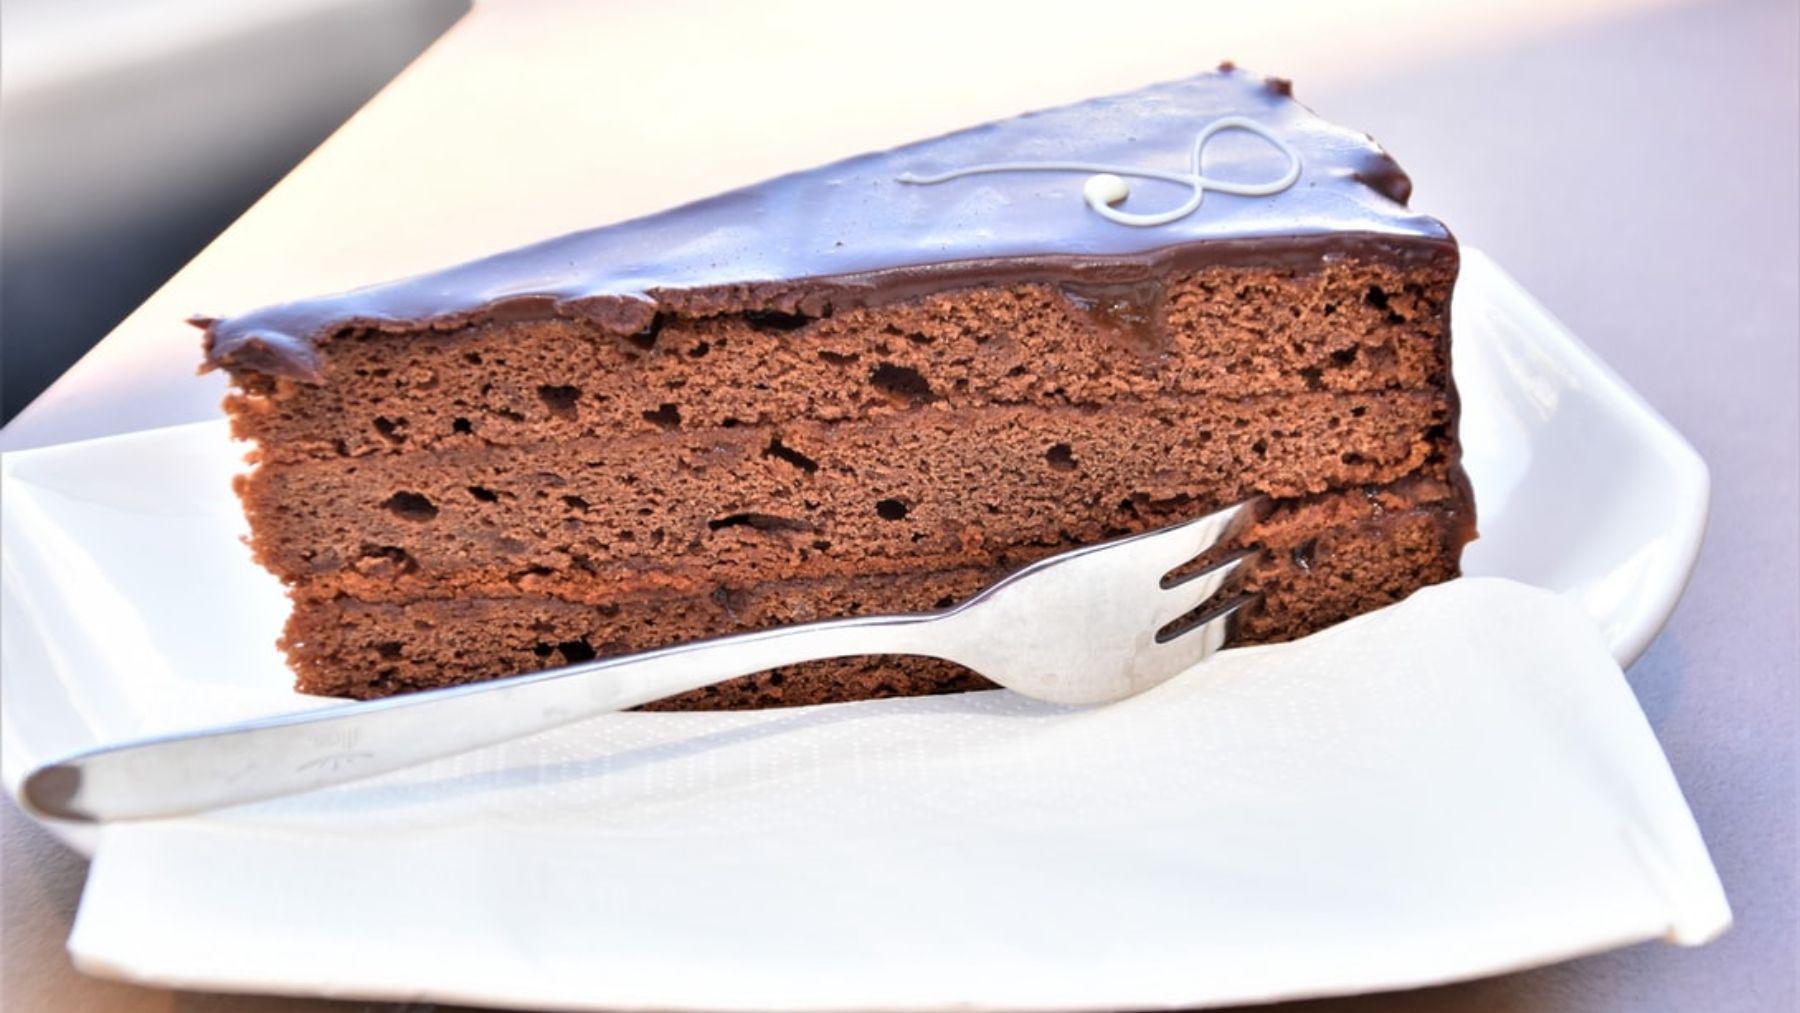 Tarta sacher al microondas, receta para amantes del chocolate lista en 10 minutos